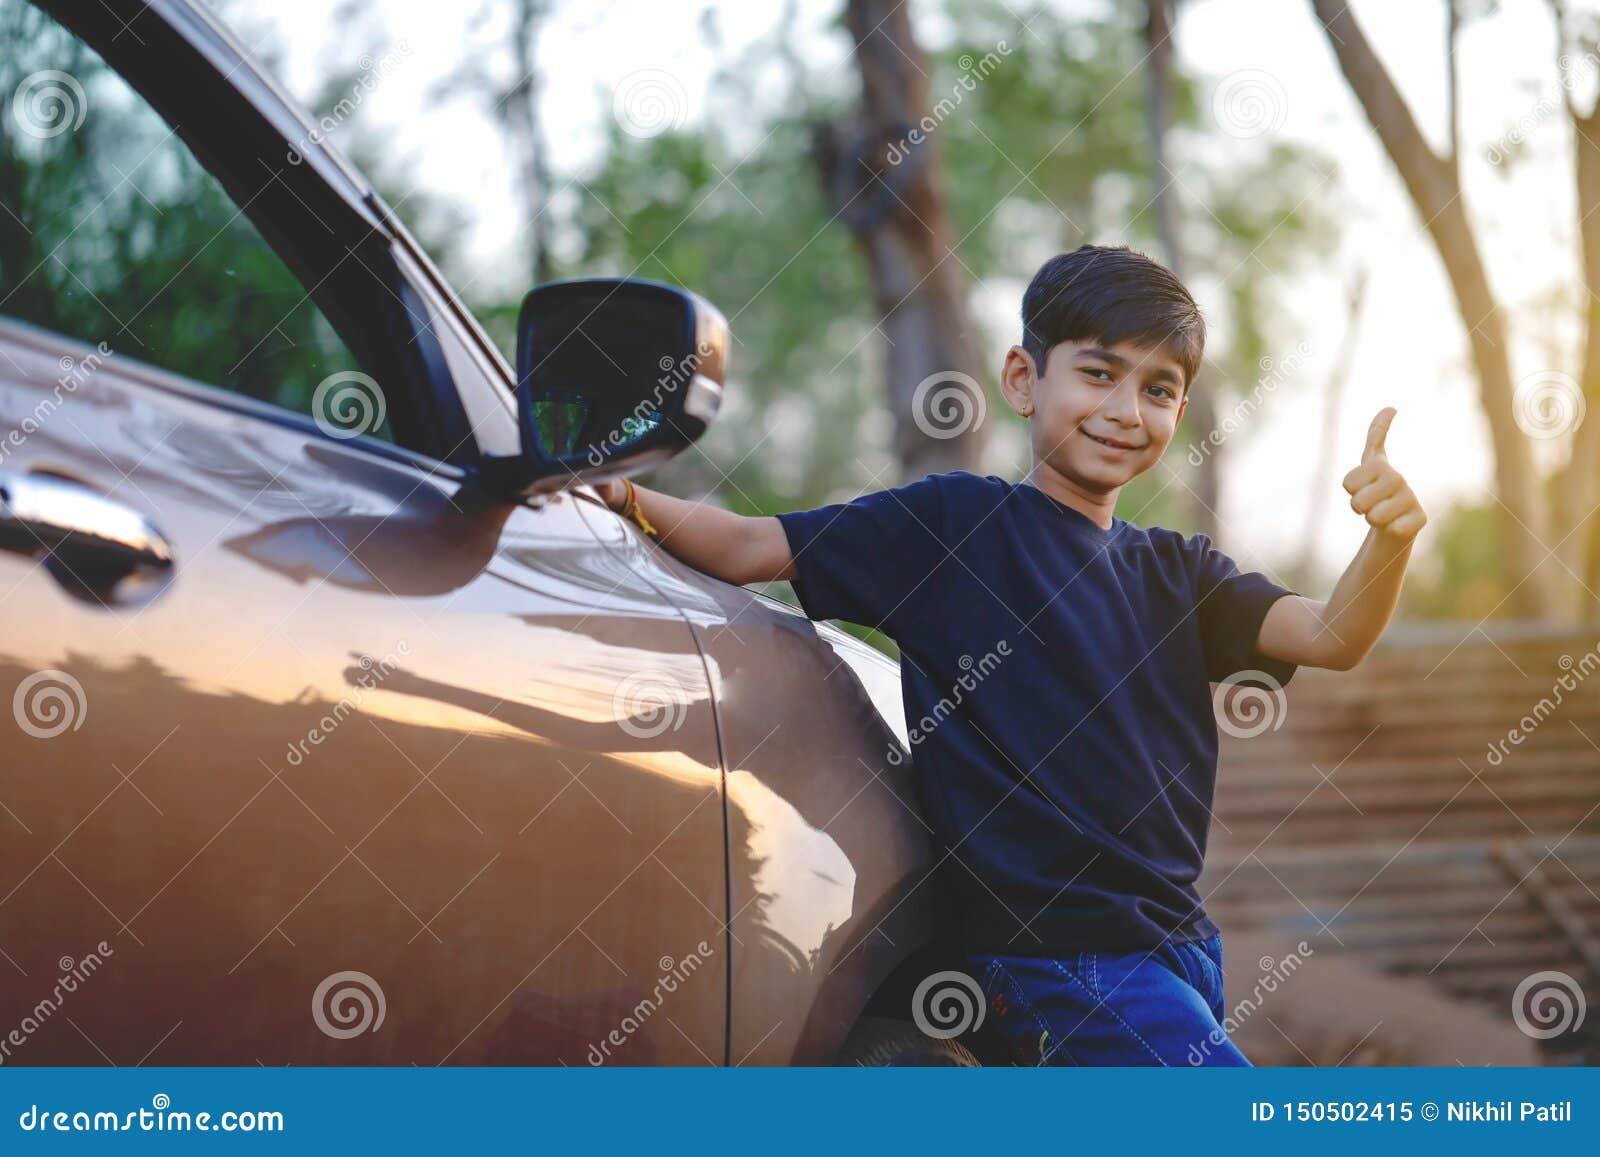 Leuk Indisch kind met auto